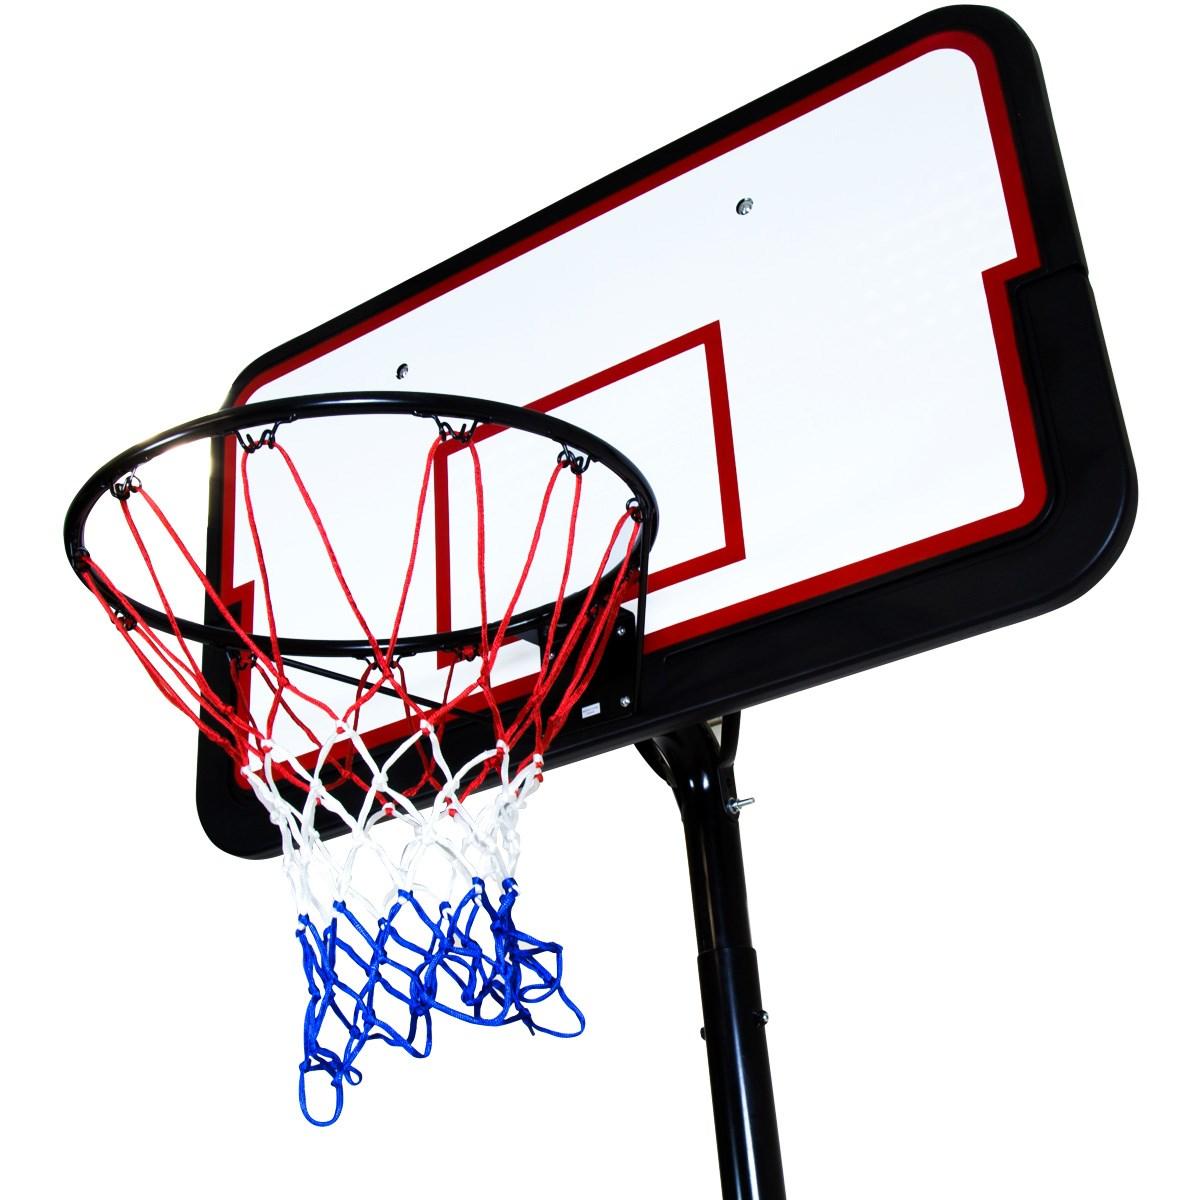 1200x1200 Adjustable Full Size Basketball Net Mount Free